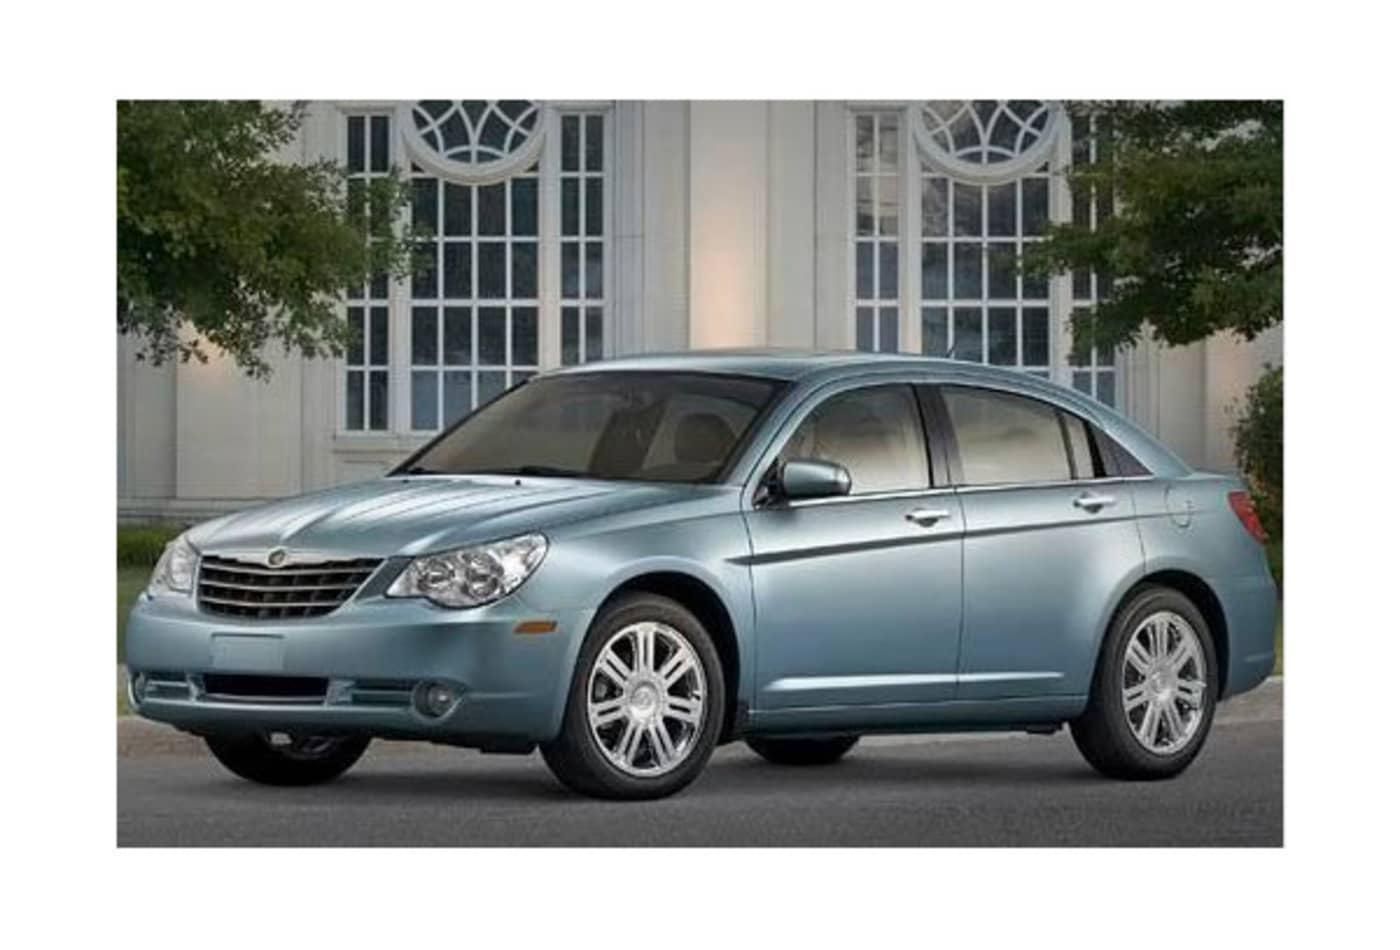 48438689 Chrysler-Sebring-Sedan-Most-Stolen-Luxury-Cars-CNBC.jpg